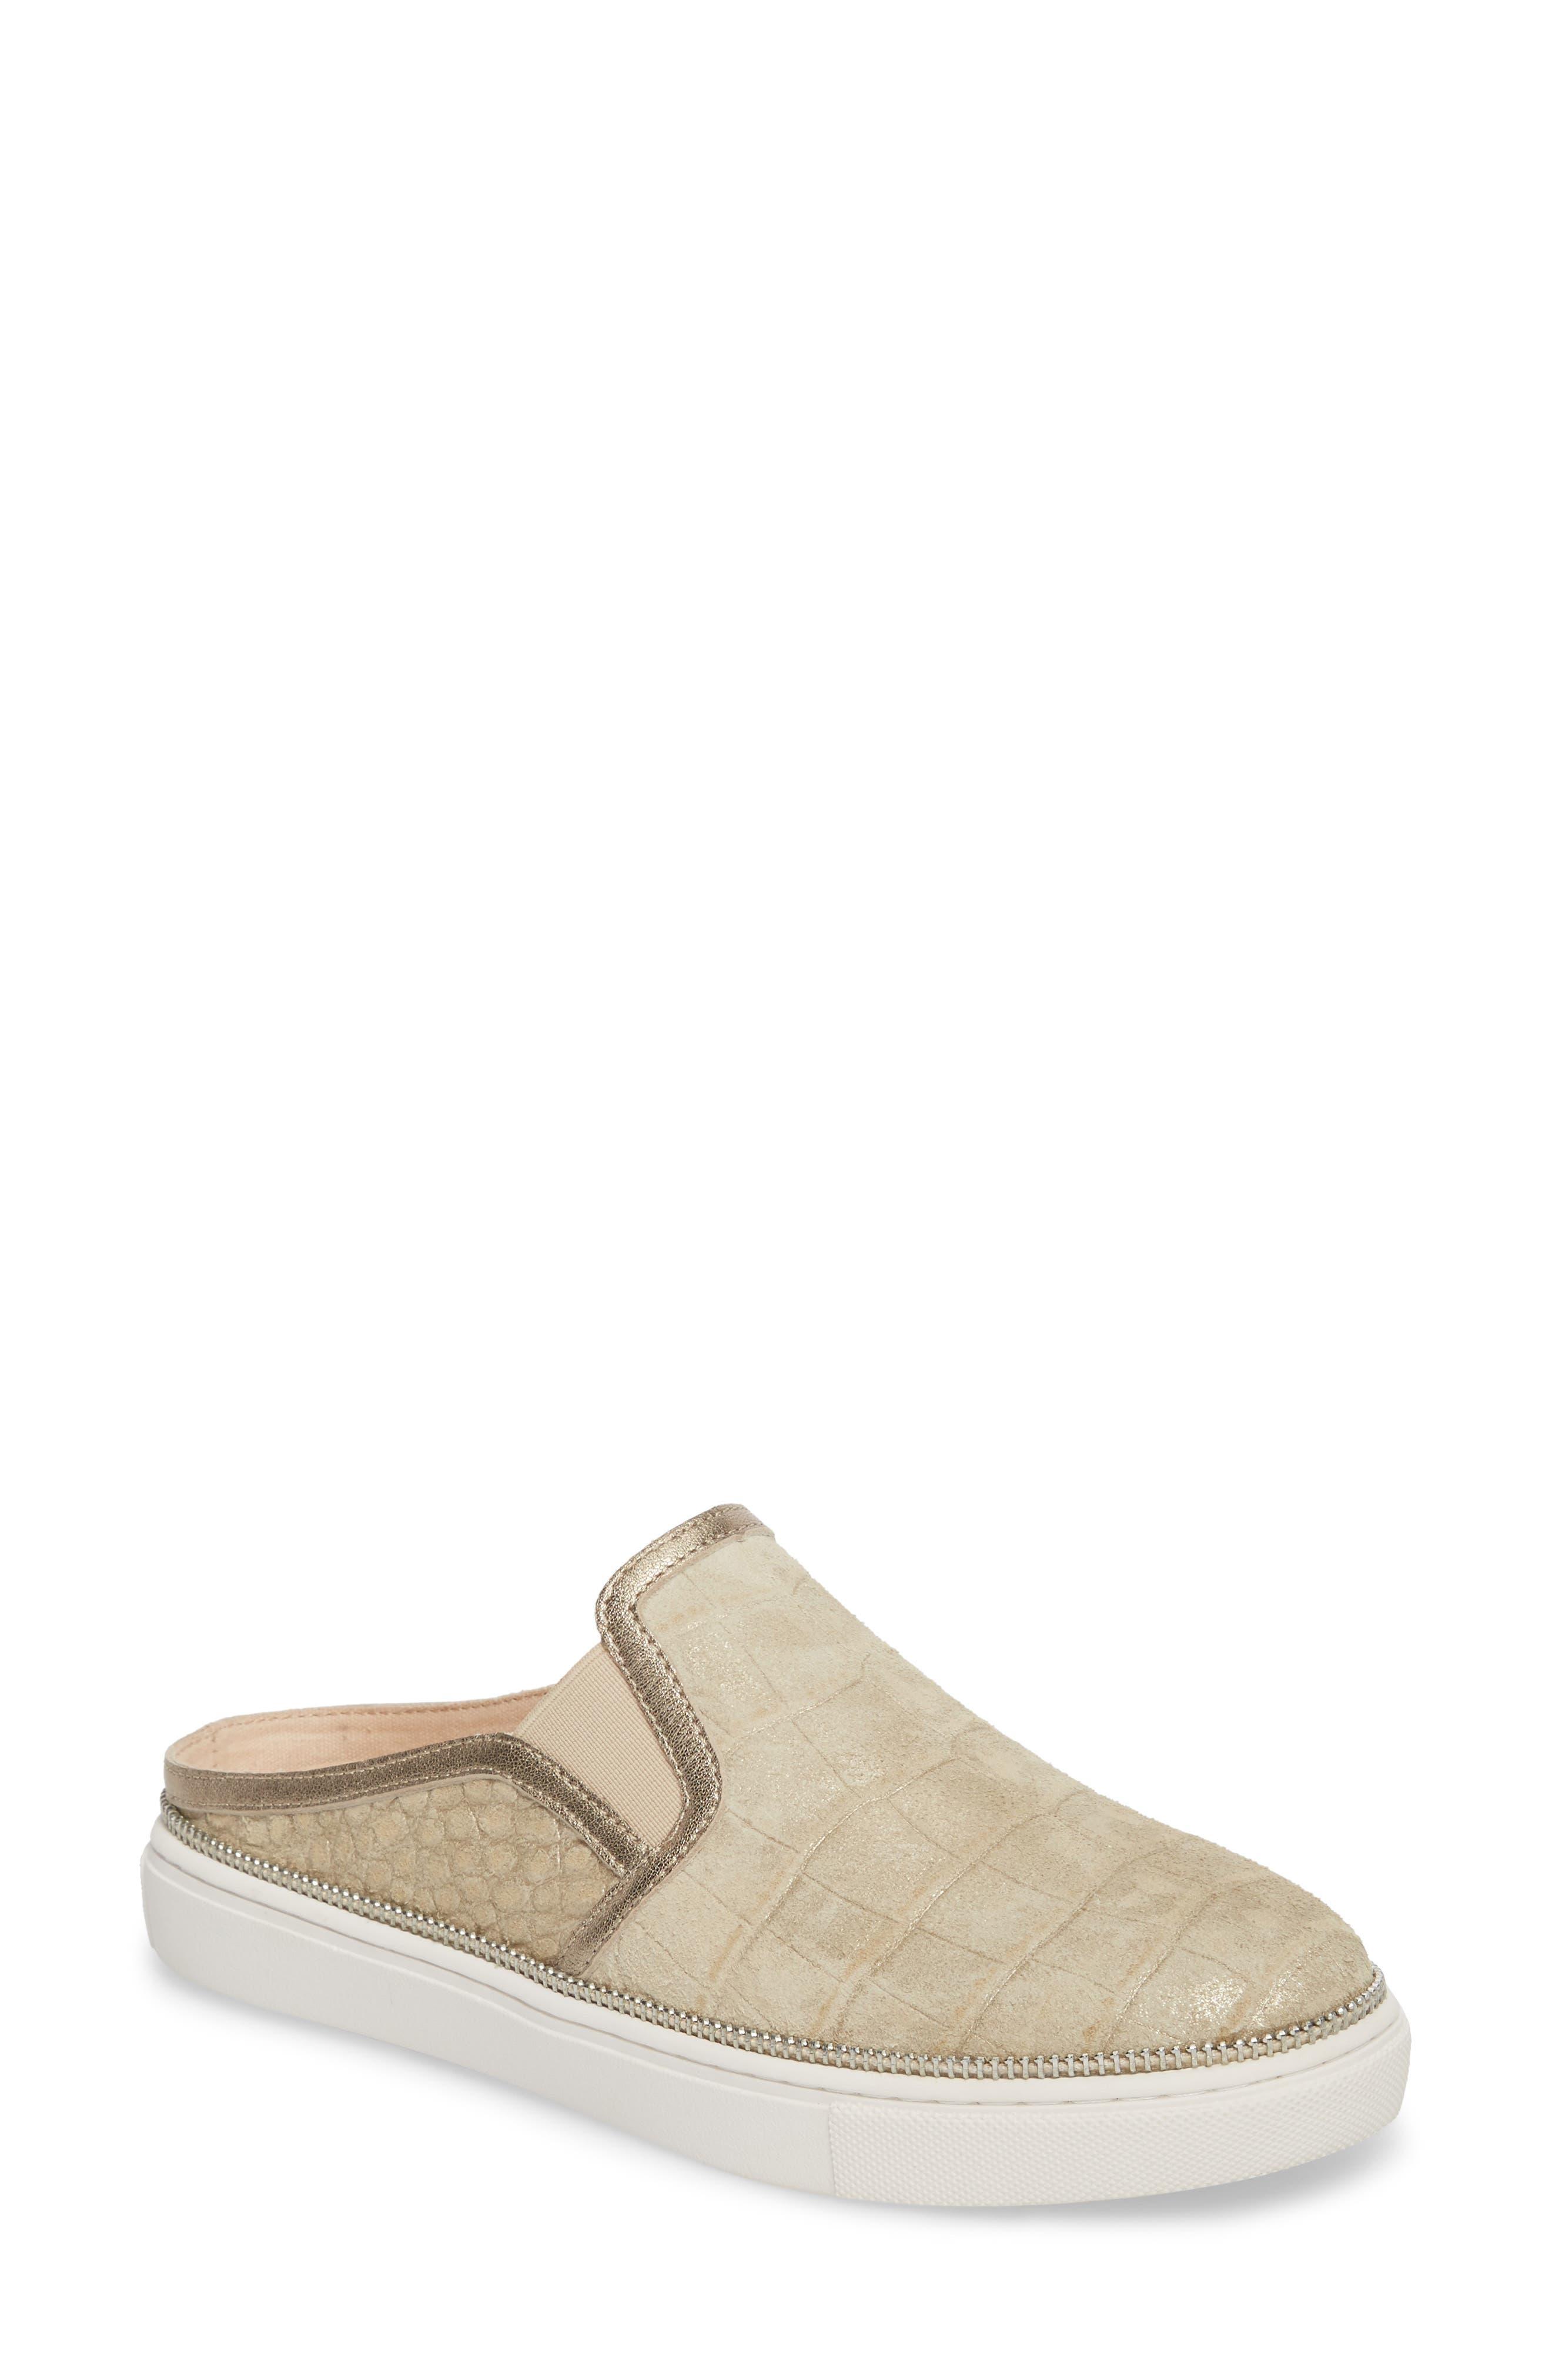 Alternate Image 1 Selected - Botkier Hayden Sneaker Mule (Women)